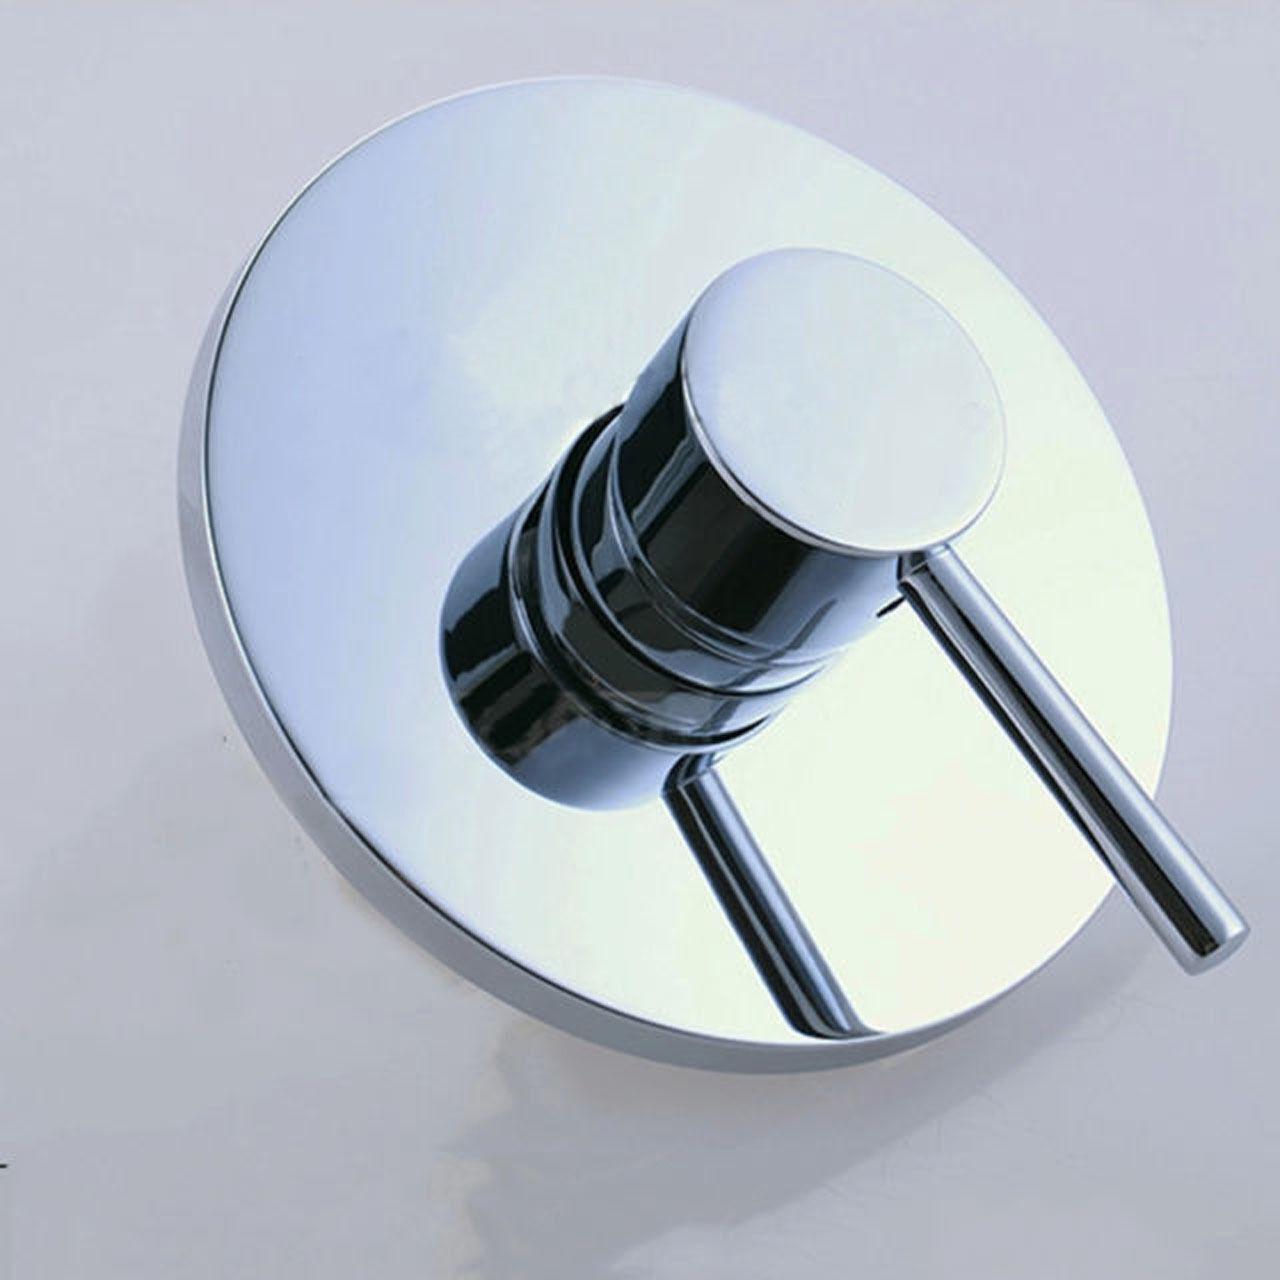 chrome shower mixer faucet control valve single handel. Black Bedroom Furniture Sets. Home Design Ideas